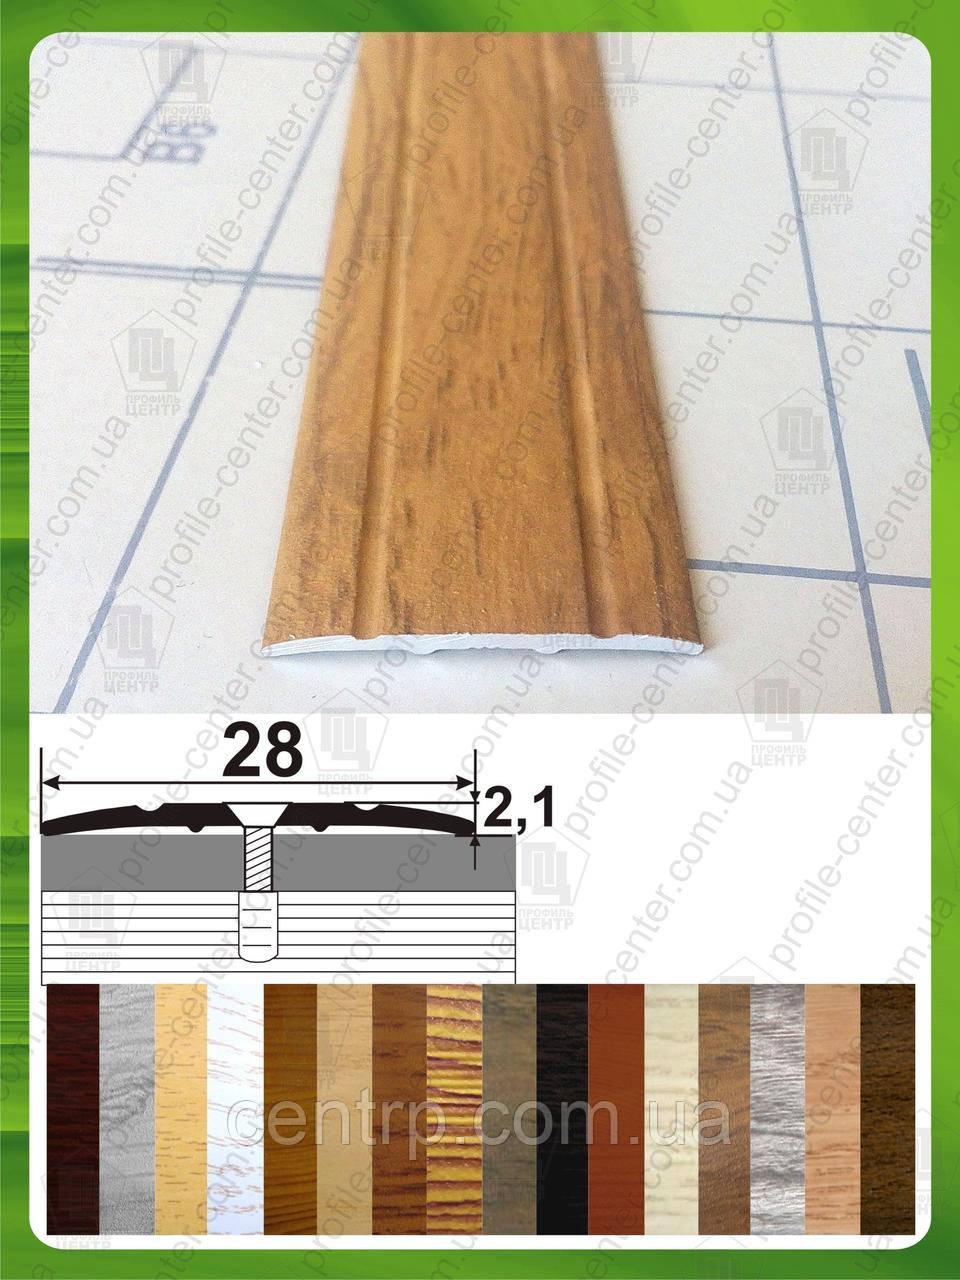 "Стыкоперекрывающий порог для пола  28 мм. АП 005 ""под дерево"" Бук (краш), 1.8 м"